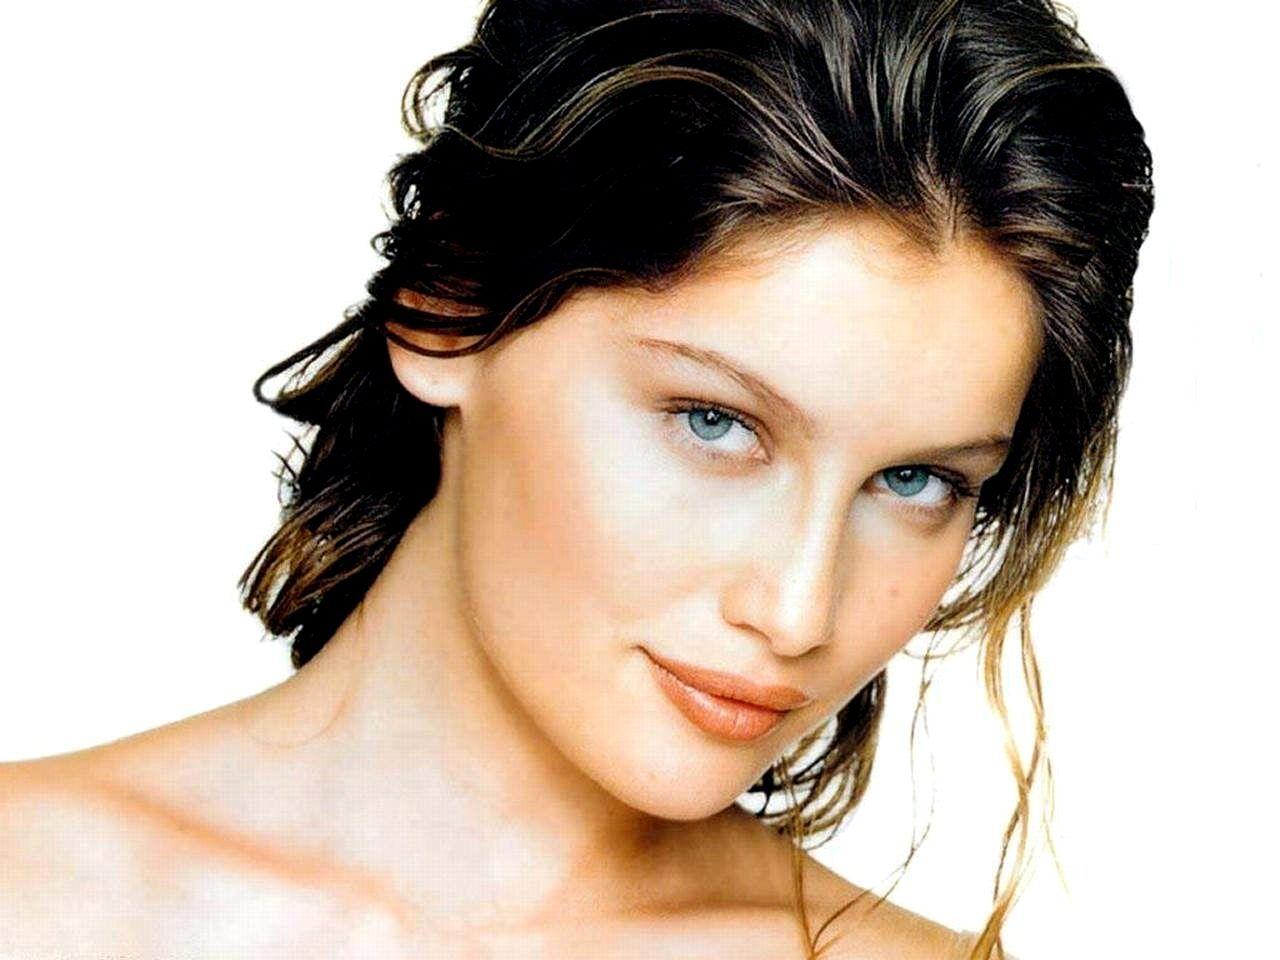 Most beautiful women hd sex